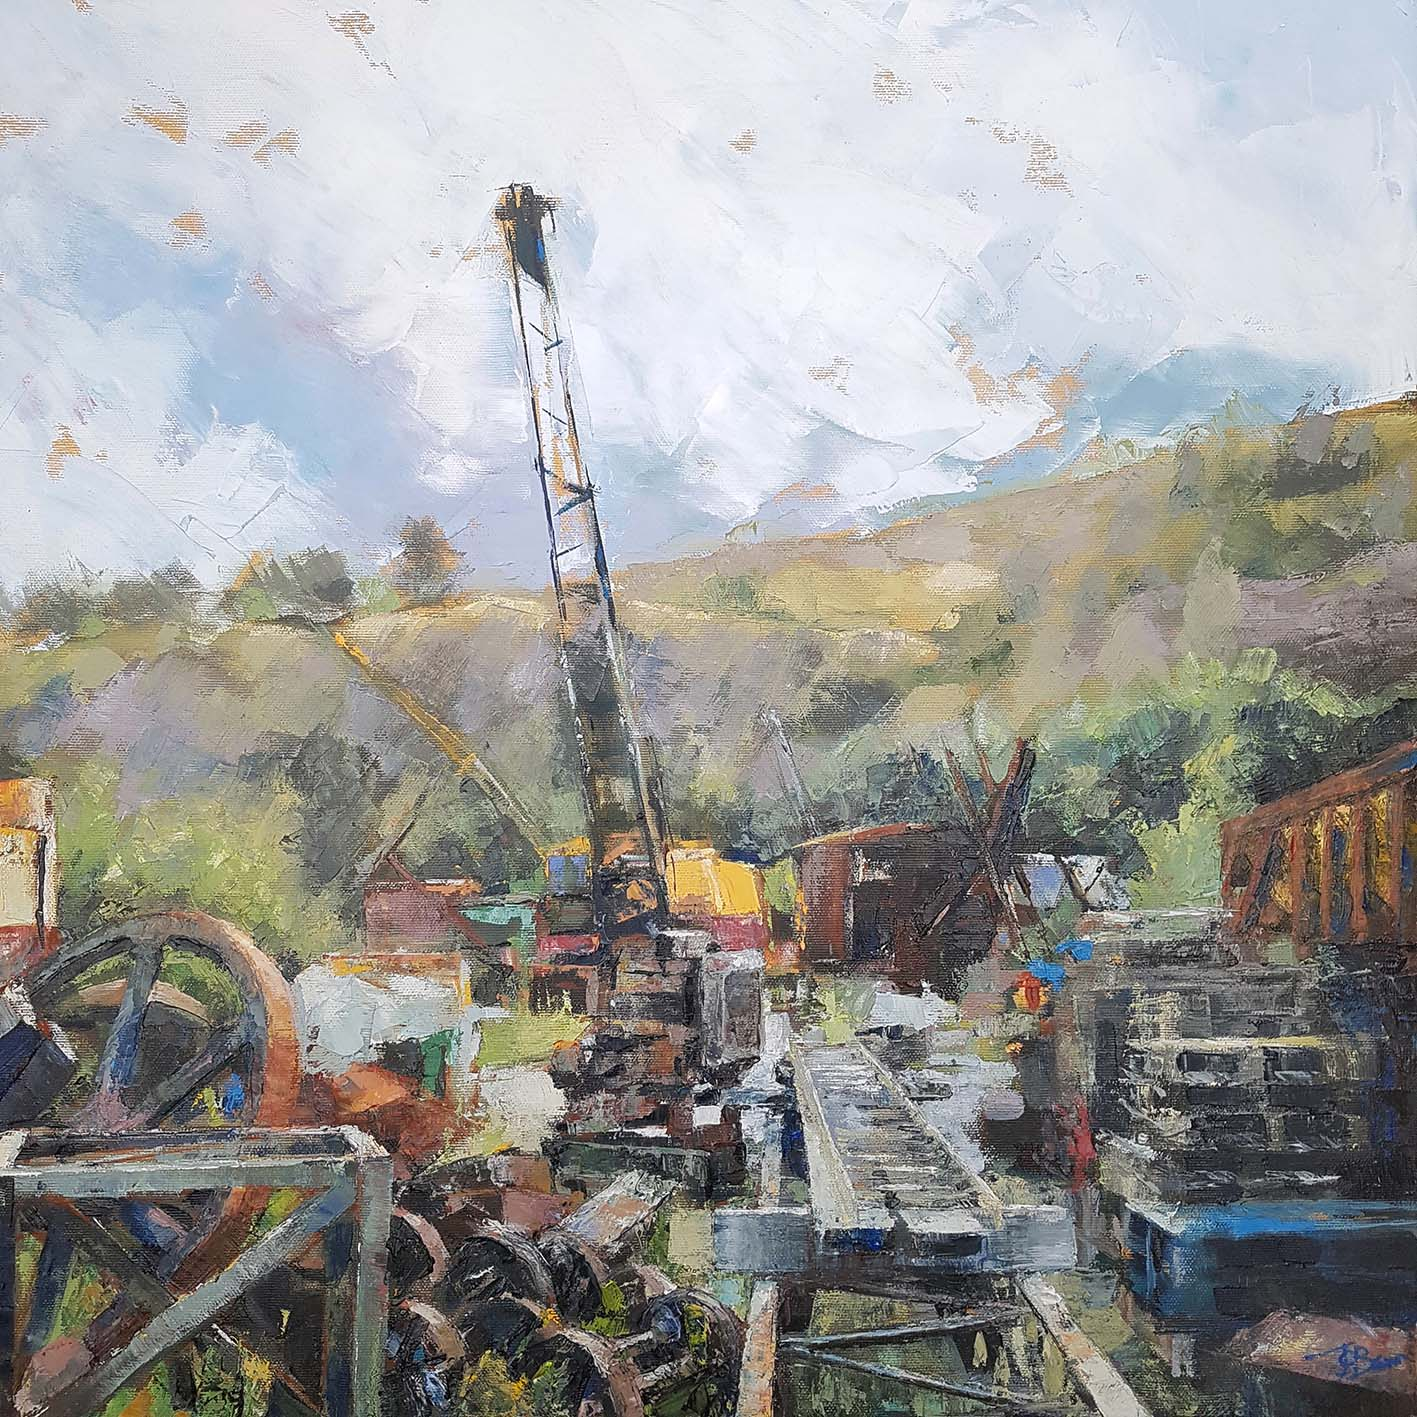 Threlkeld II 2020, Oil on canvas, 61 x 61 x 3.8cm | Julia Brown